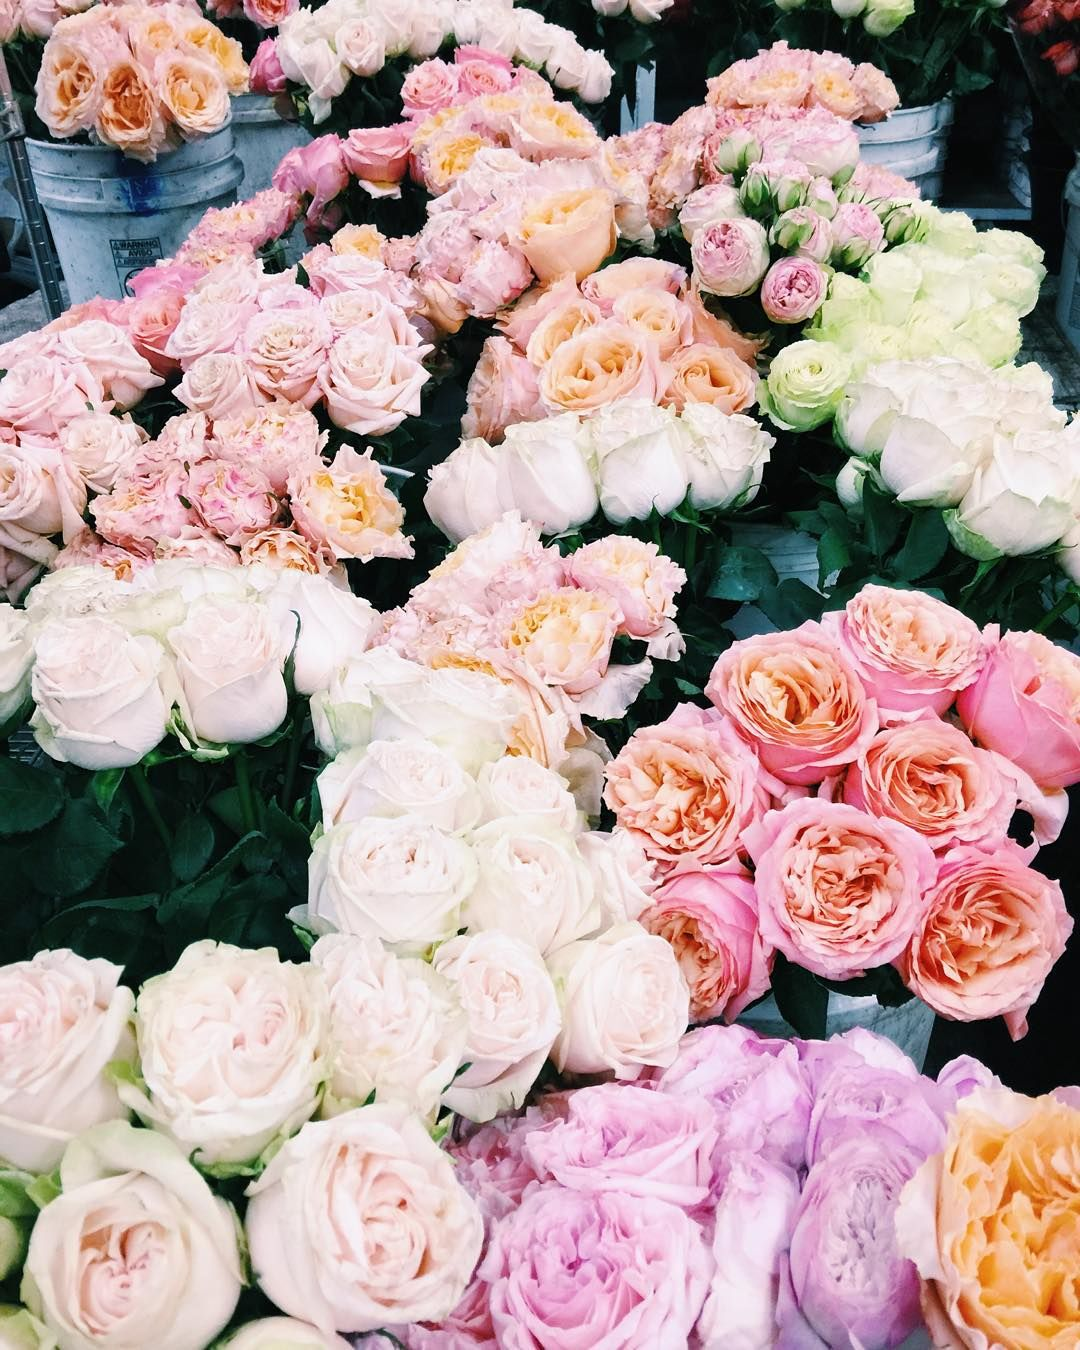 Having a very lovely rosy morning with rosielondoner at the having a very lovely rosy morning with rosielondoner at the sfflowermart sanfrancisco rosesonrosesonroses heaven izmirmasajfo